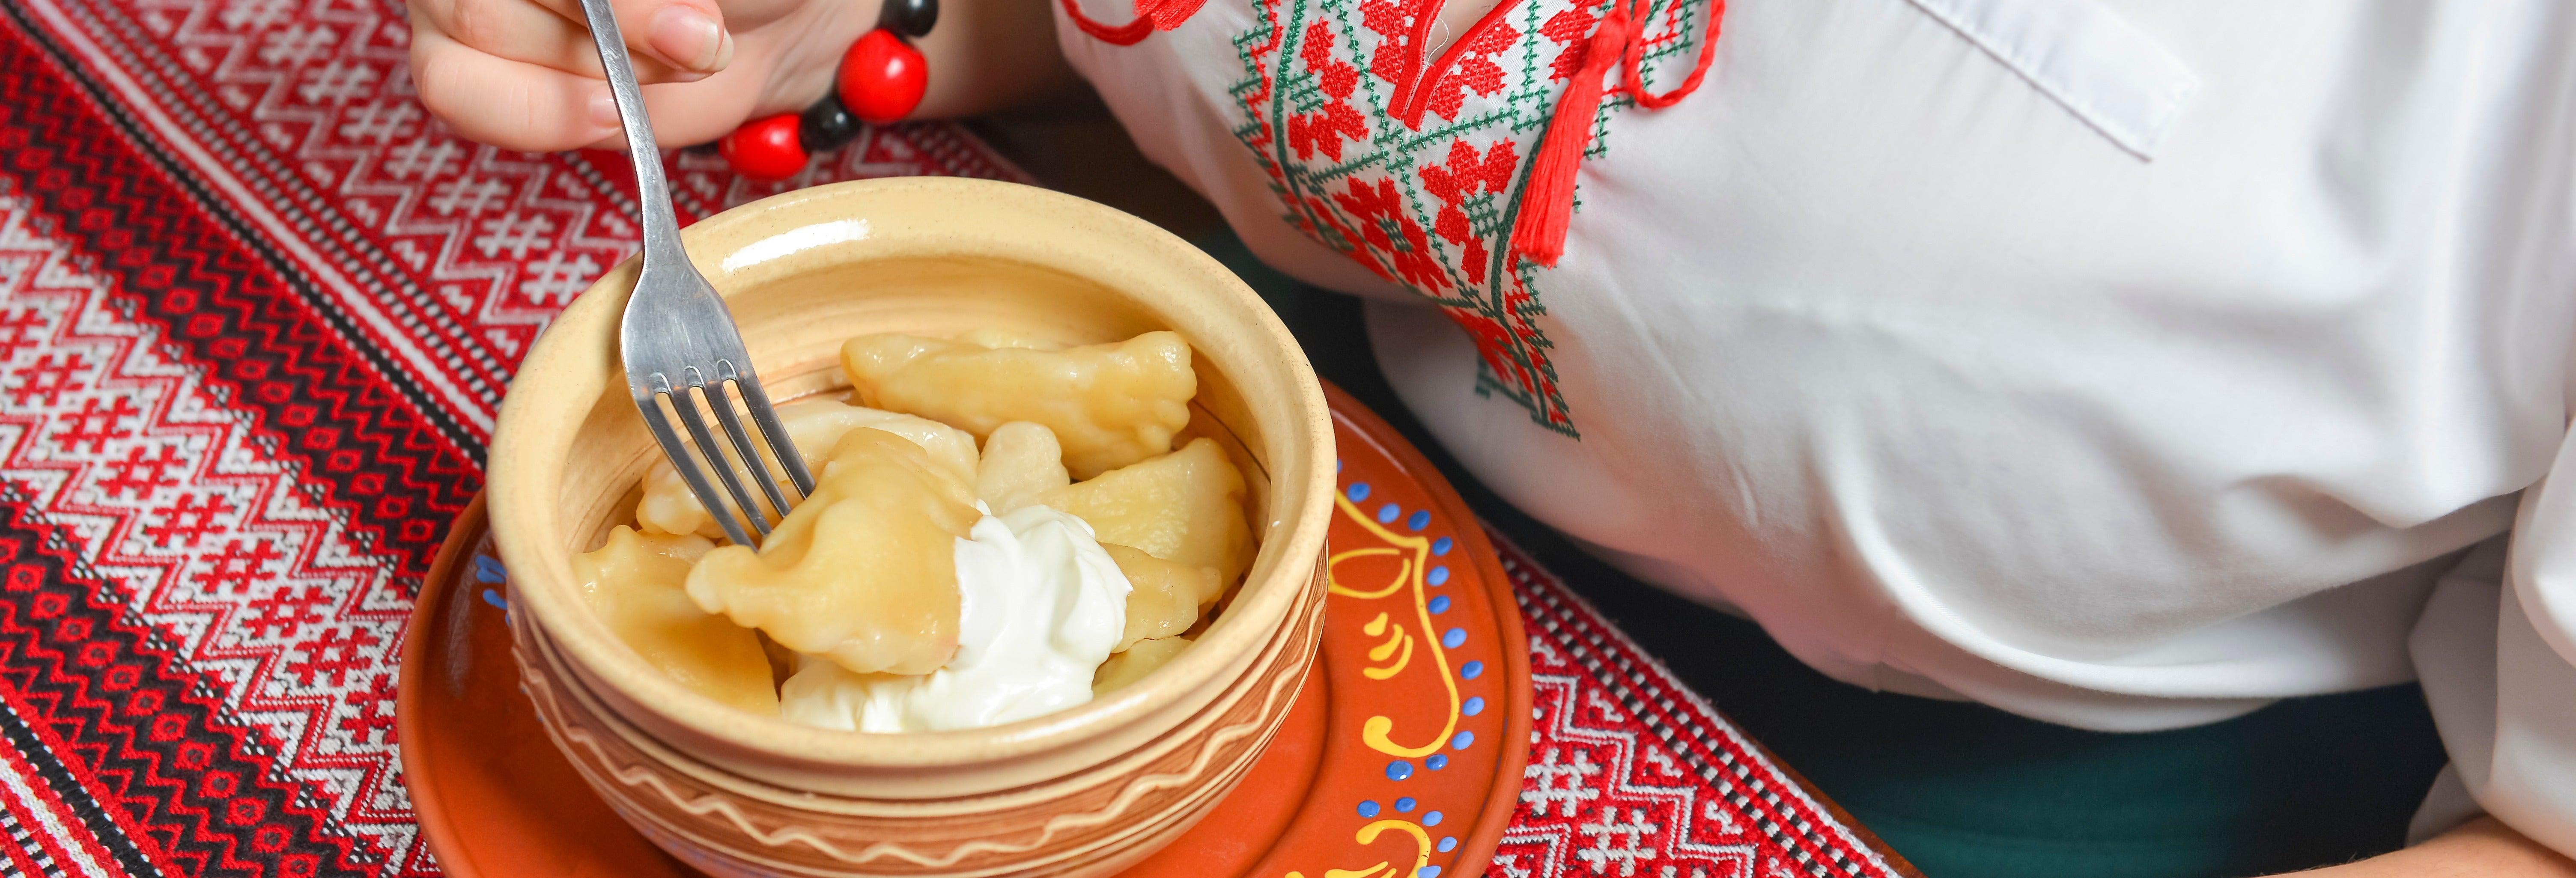 Tour gastronómico por Kiev